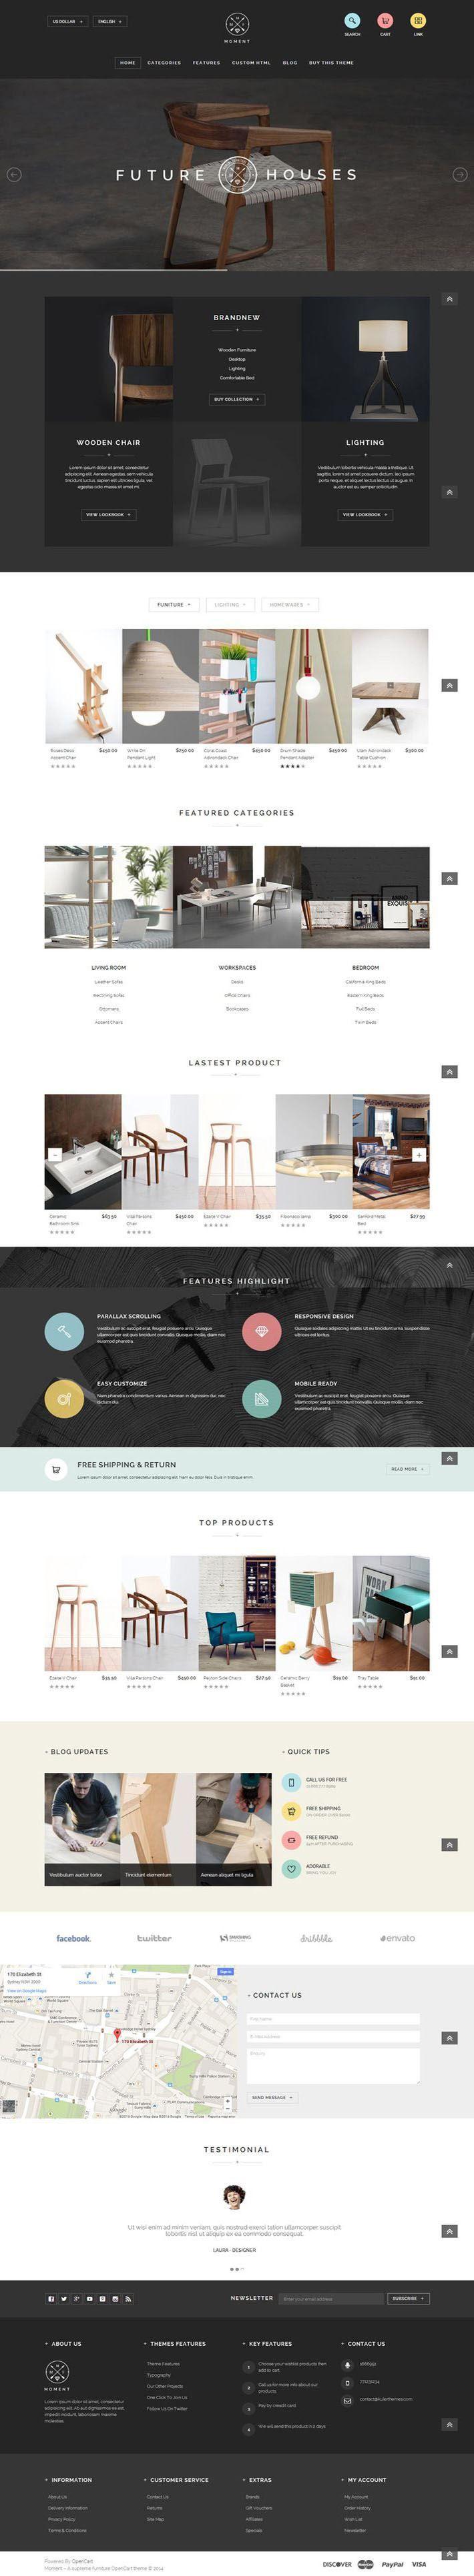 Web Design furniture minimalist clean web design